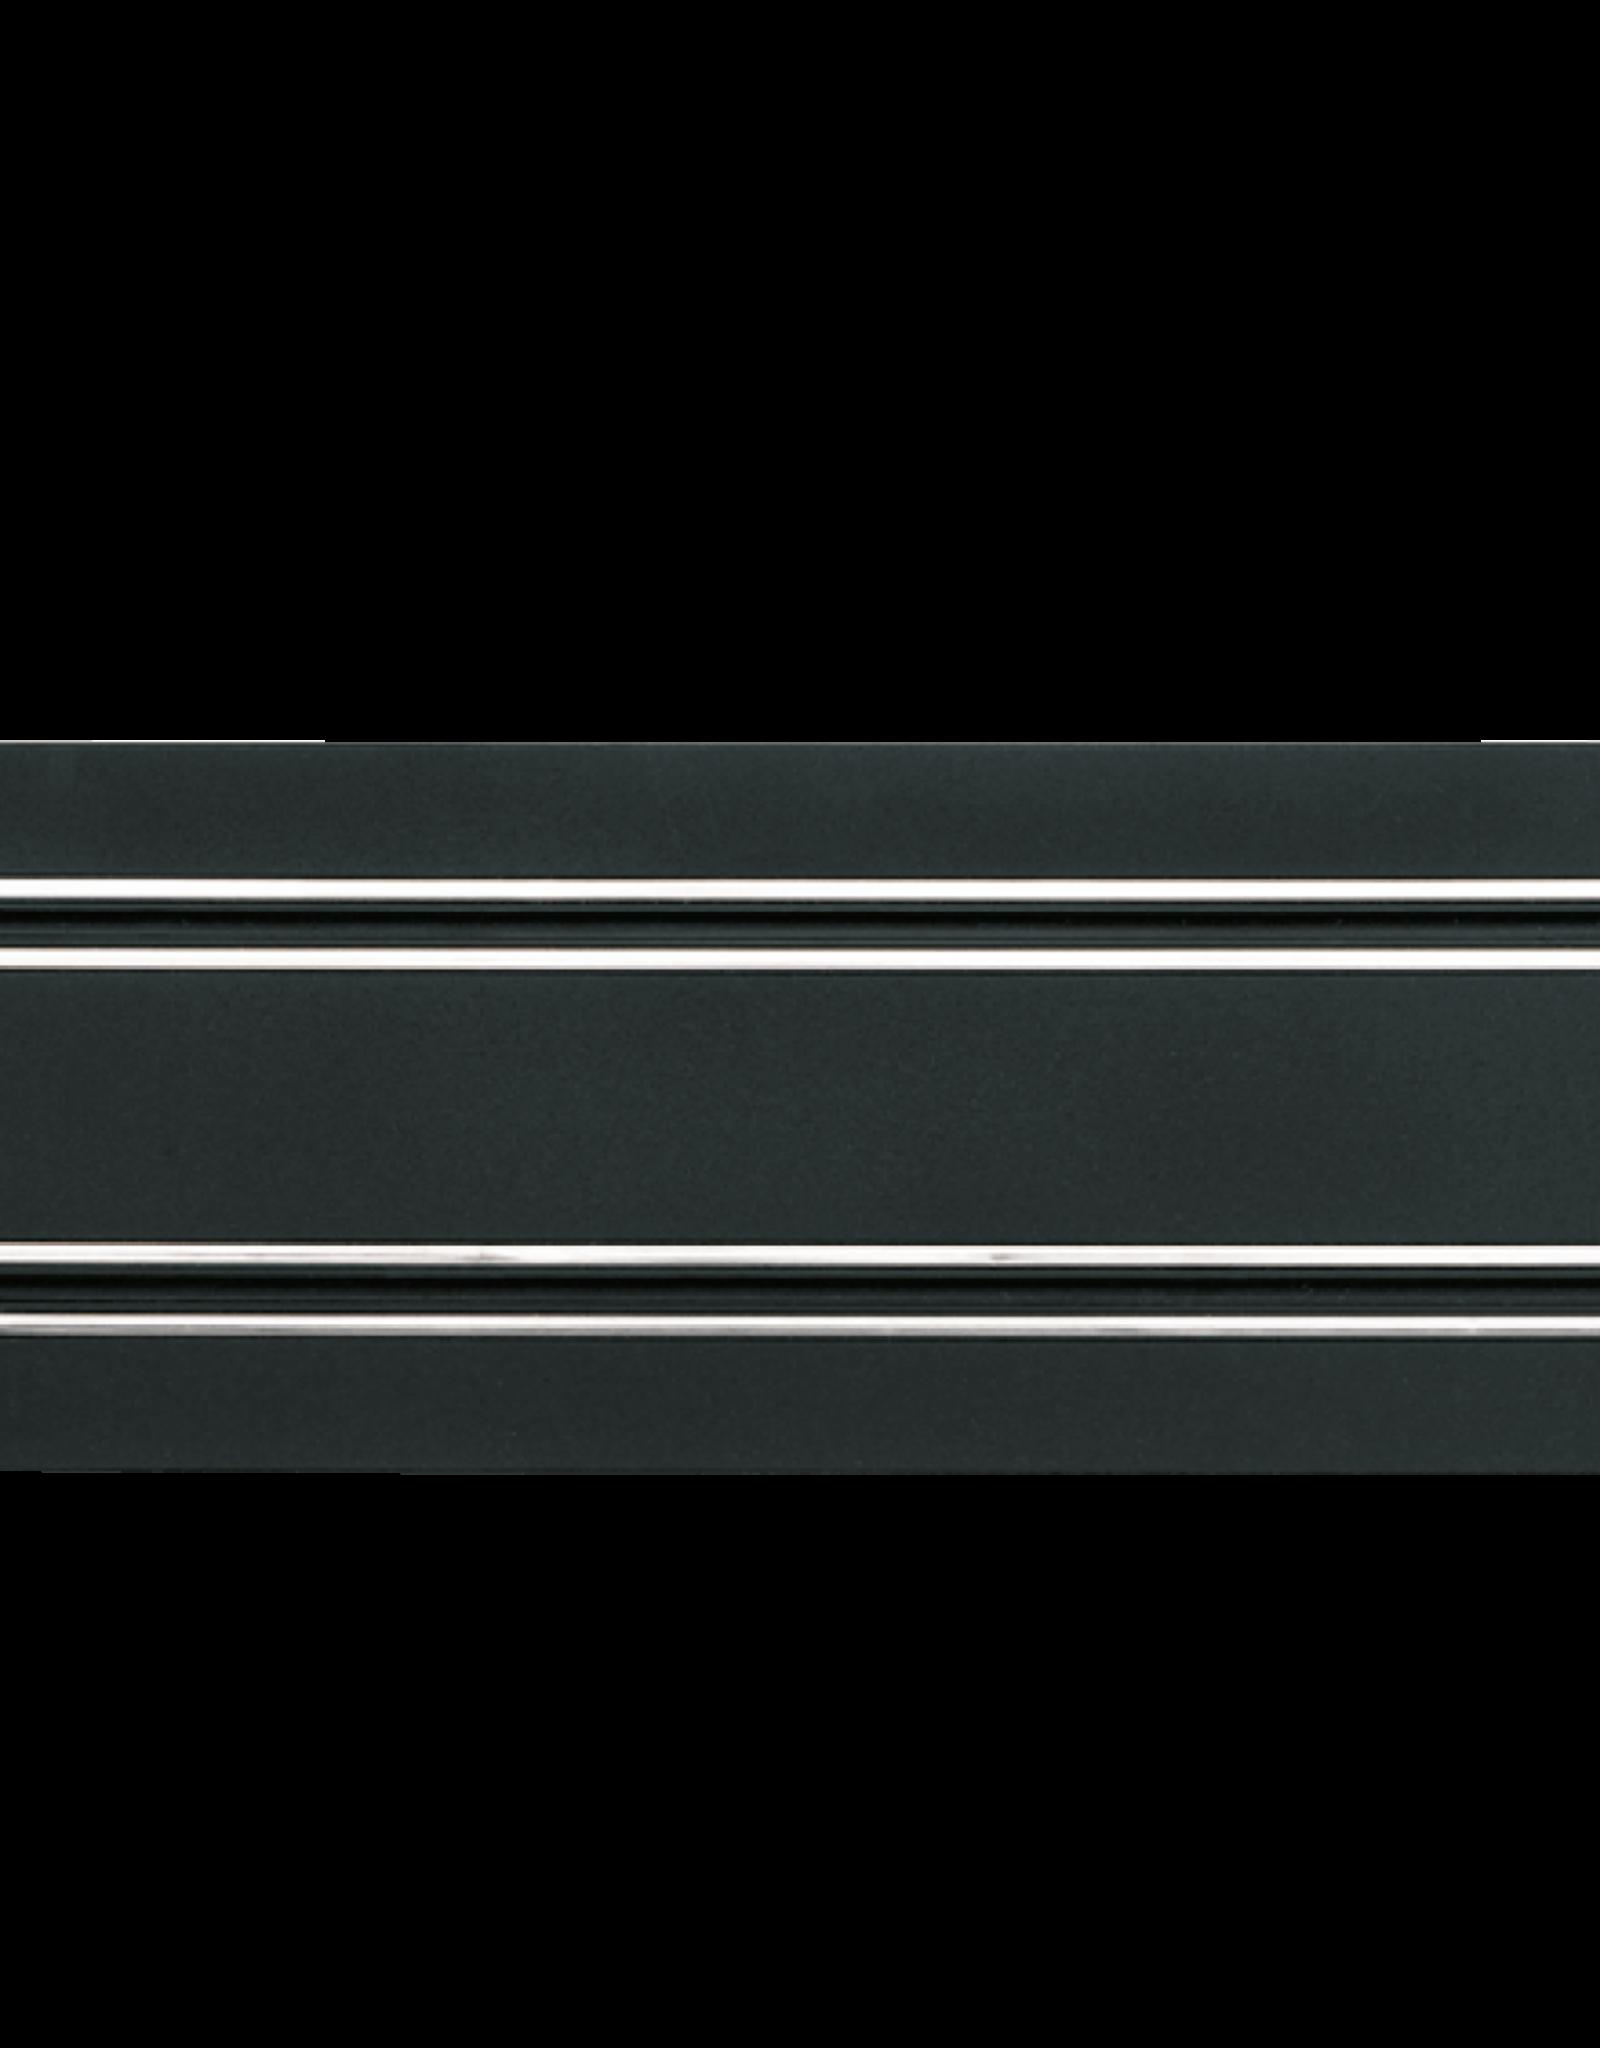 carrera CAR61602 Straights 13.46 in / 342 mm(2)